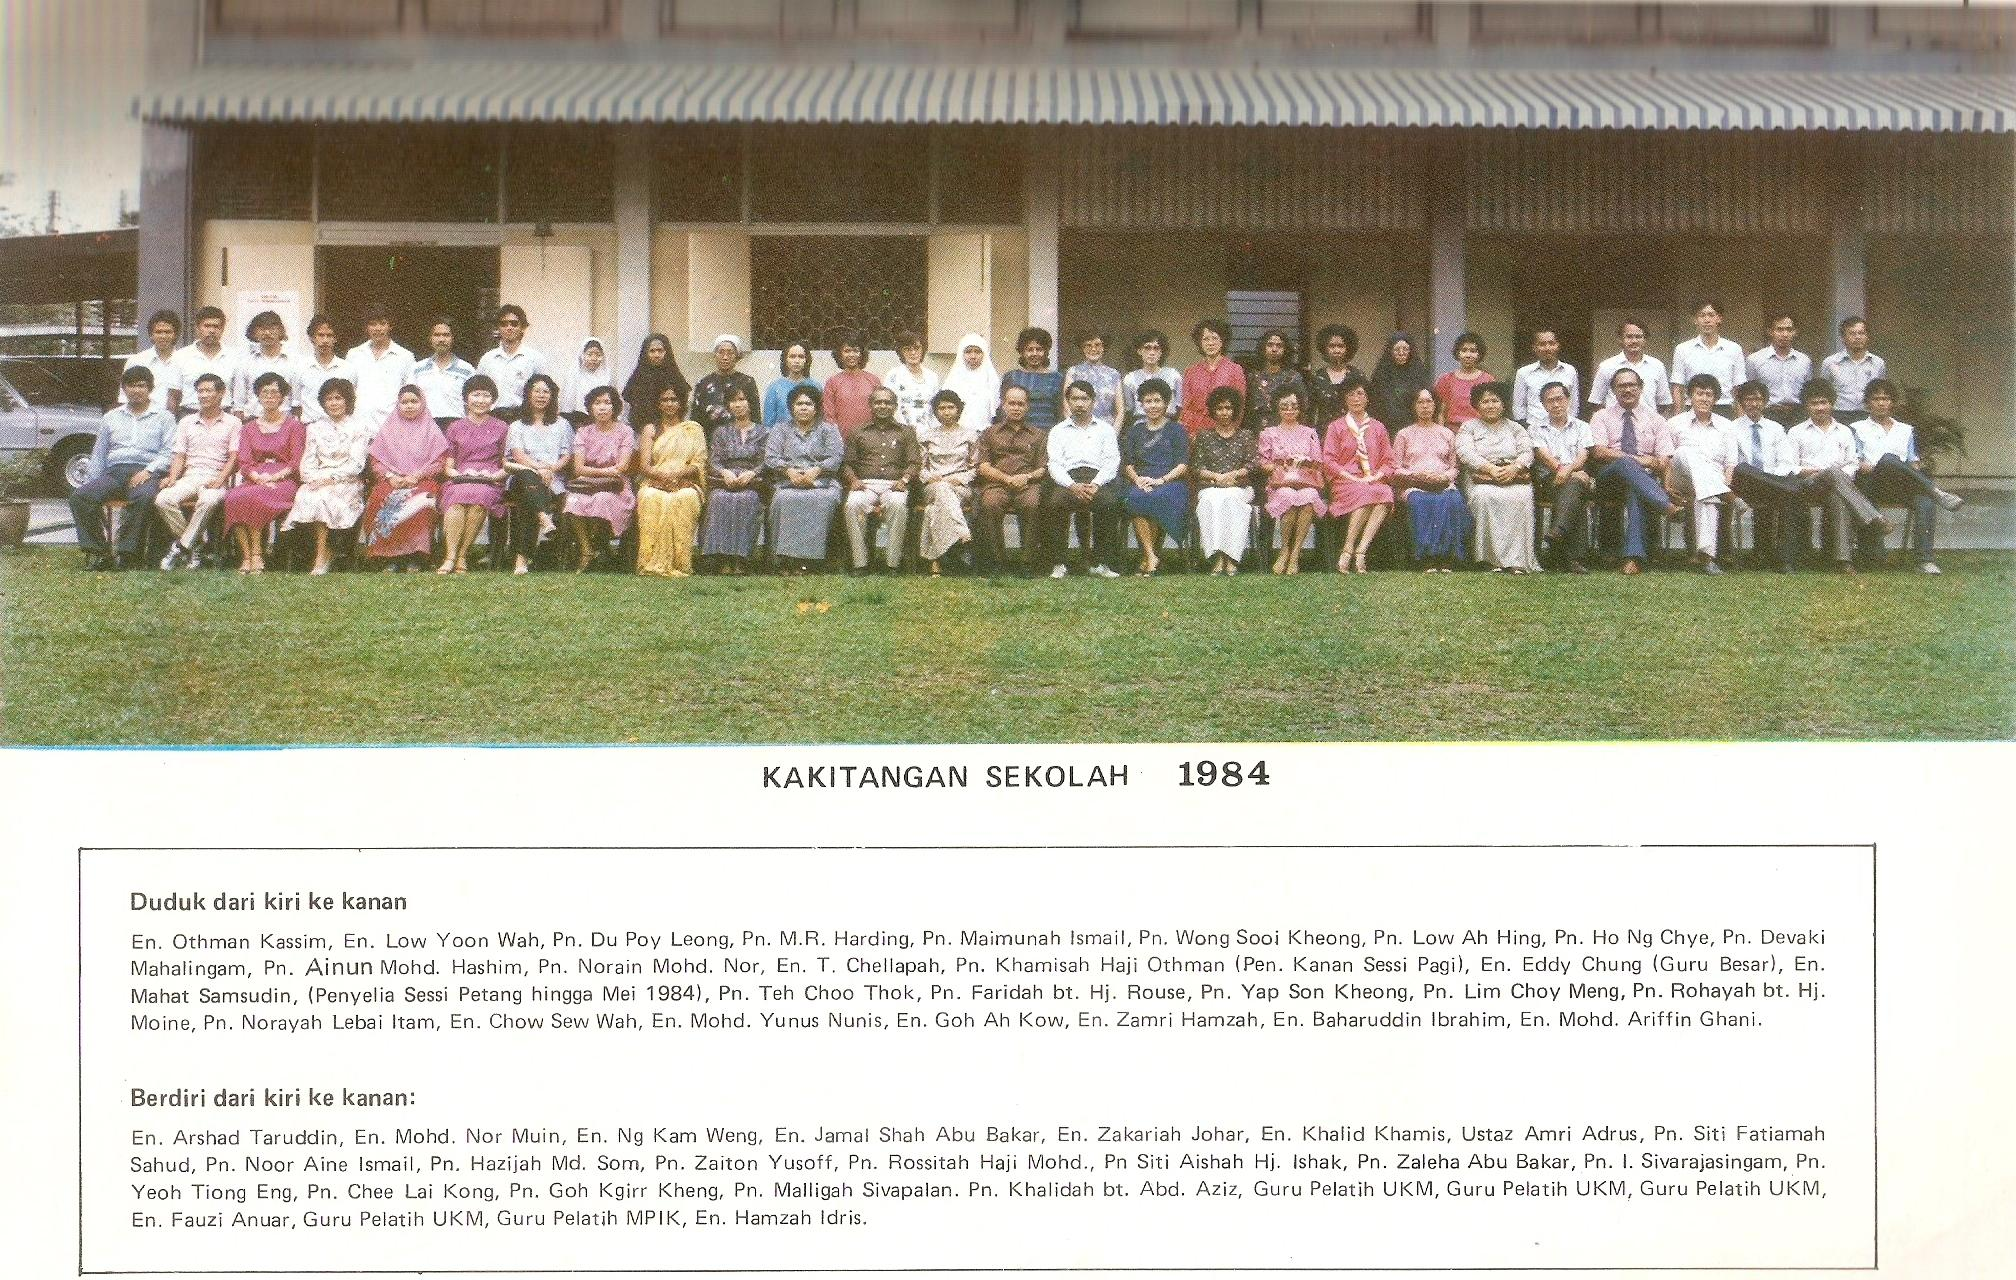 kakitangan sekolah 1984